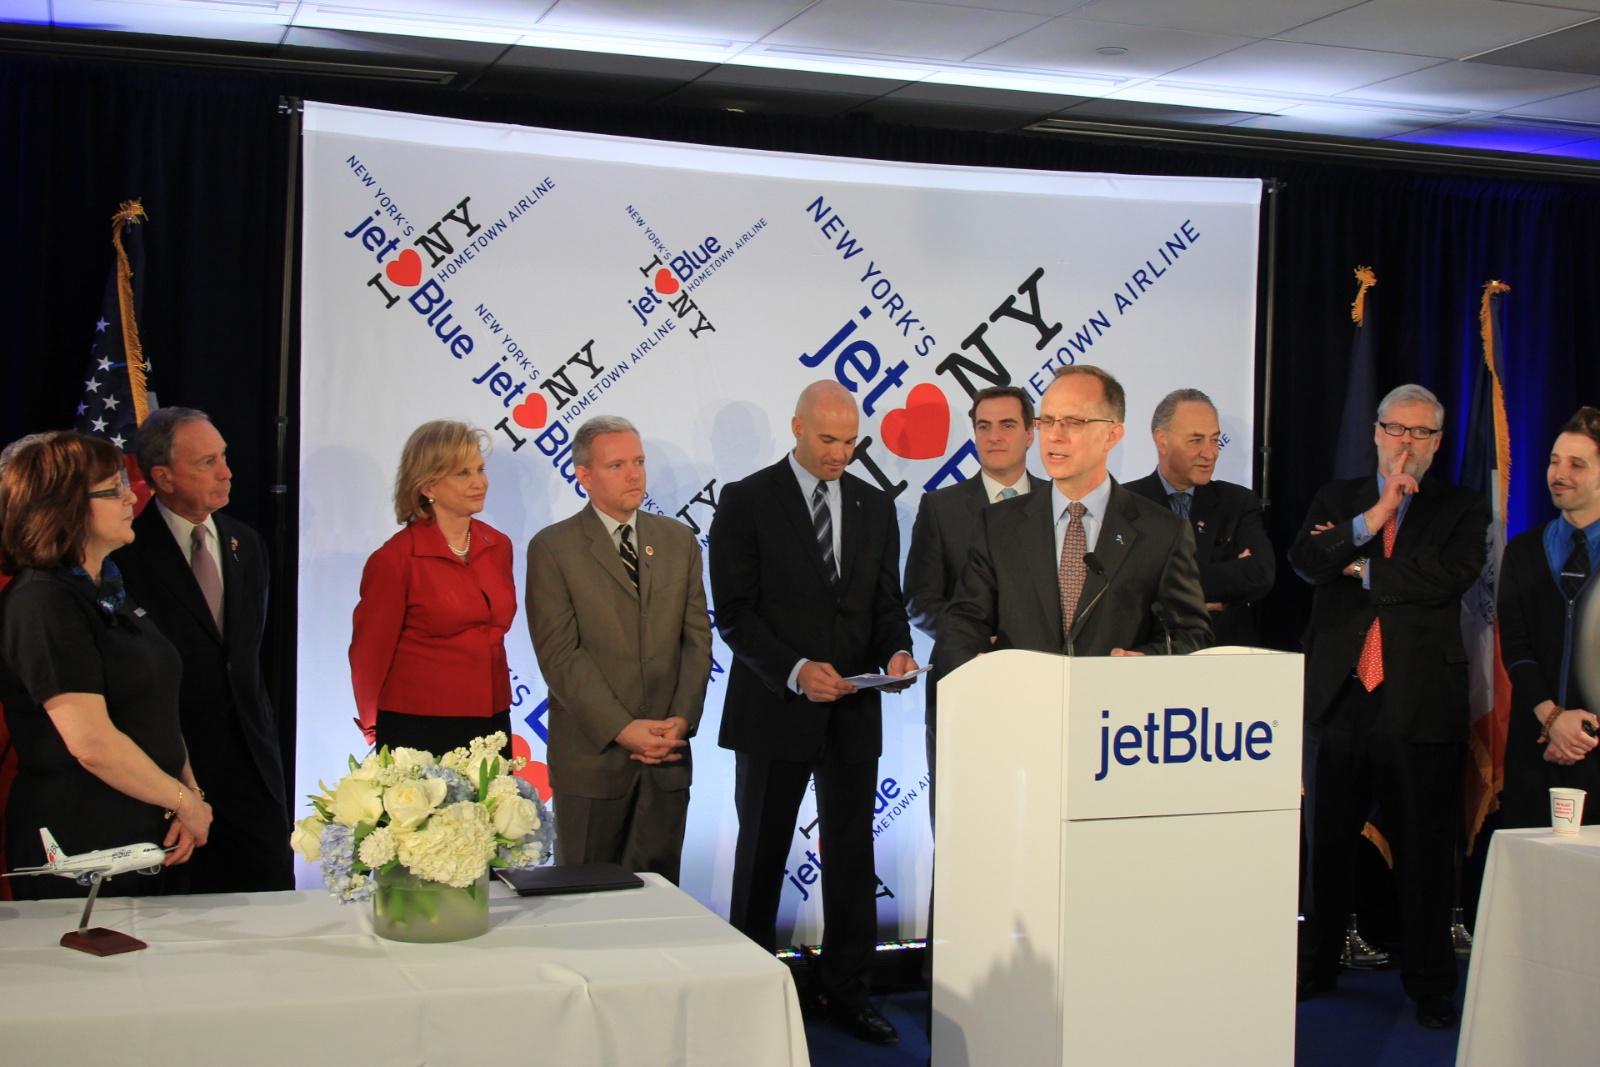 jetBlue LIC 4.jpg